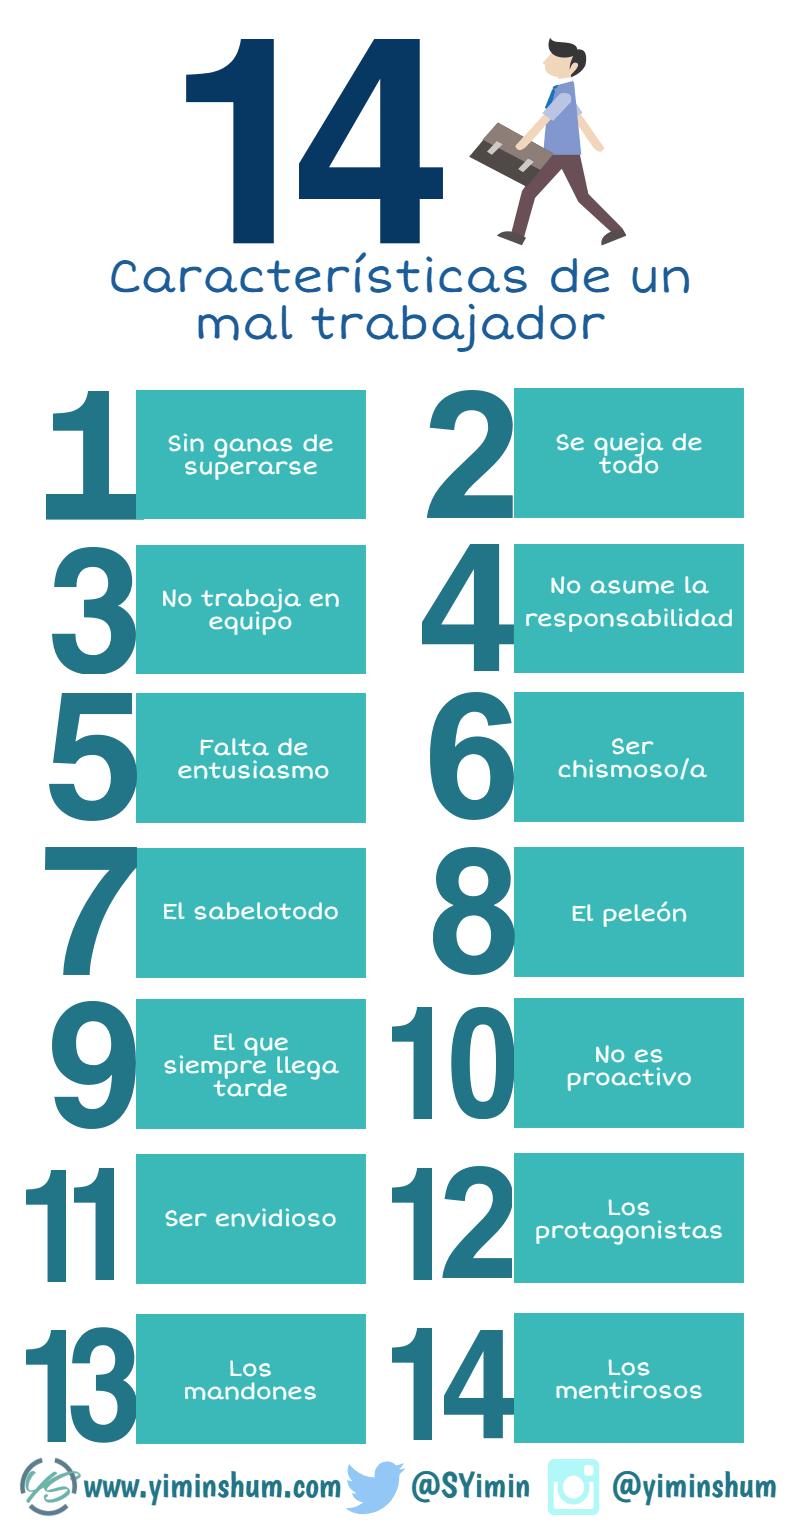 14 características de un mal trabajador #infografia #infographic #rrhh